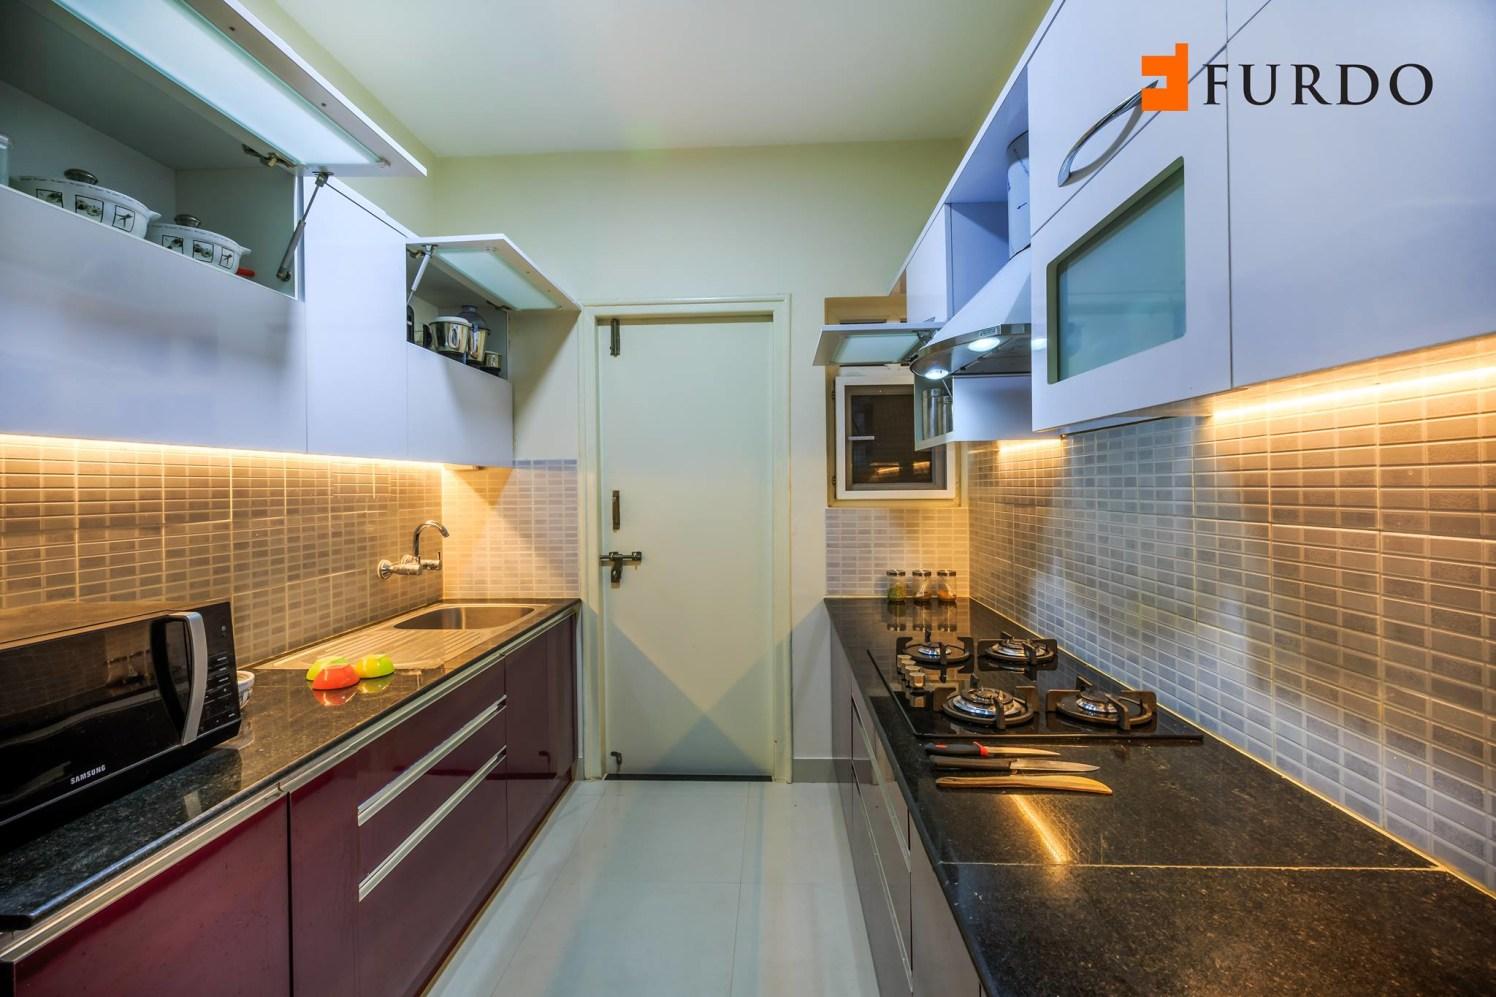 Parallel Kitchen With Marble Top Cabinets by Furdo.com Modular-kitchen Modern   Interior Design Photos & Ideas